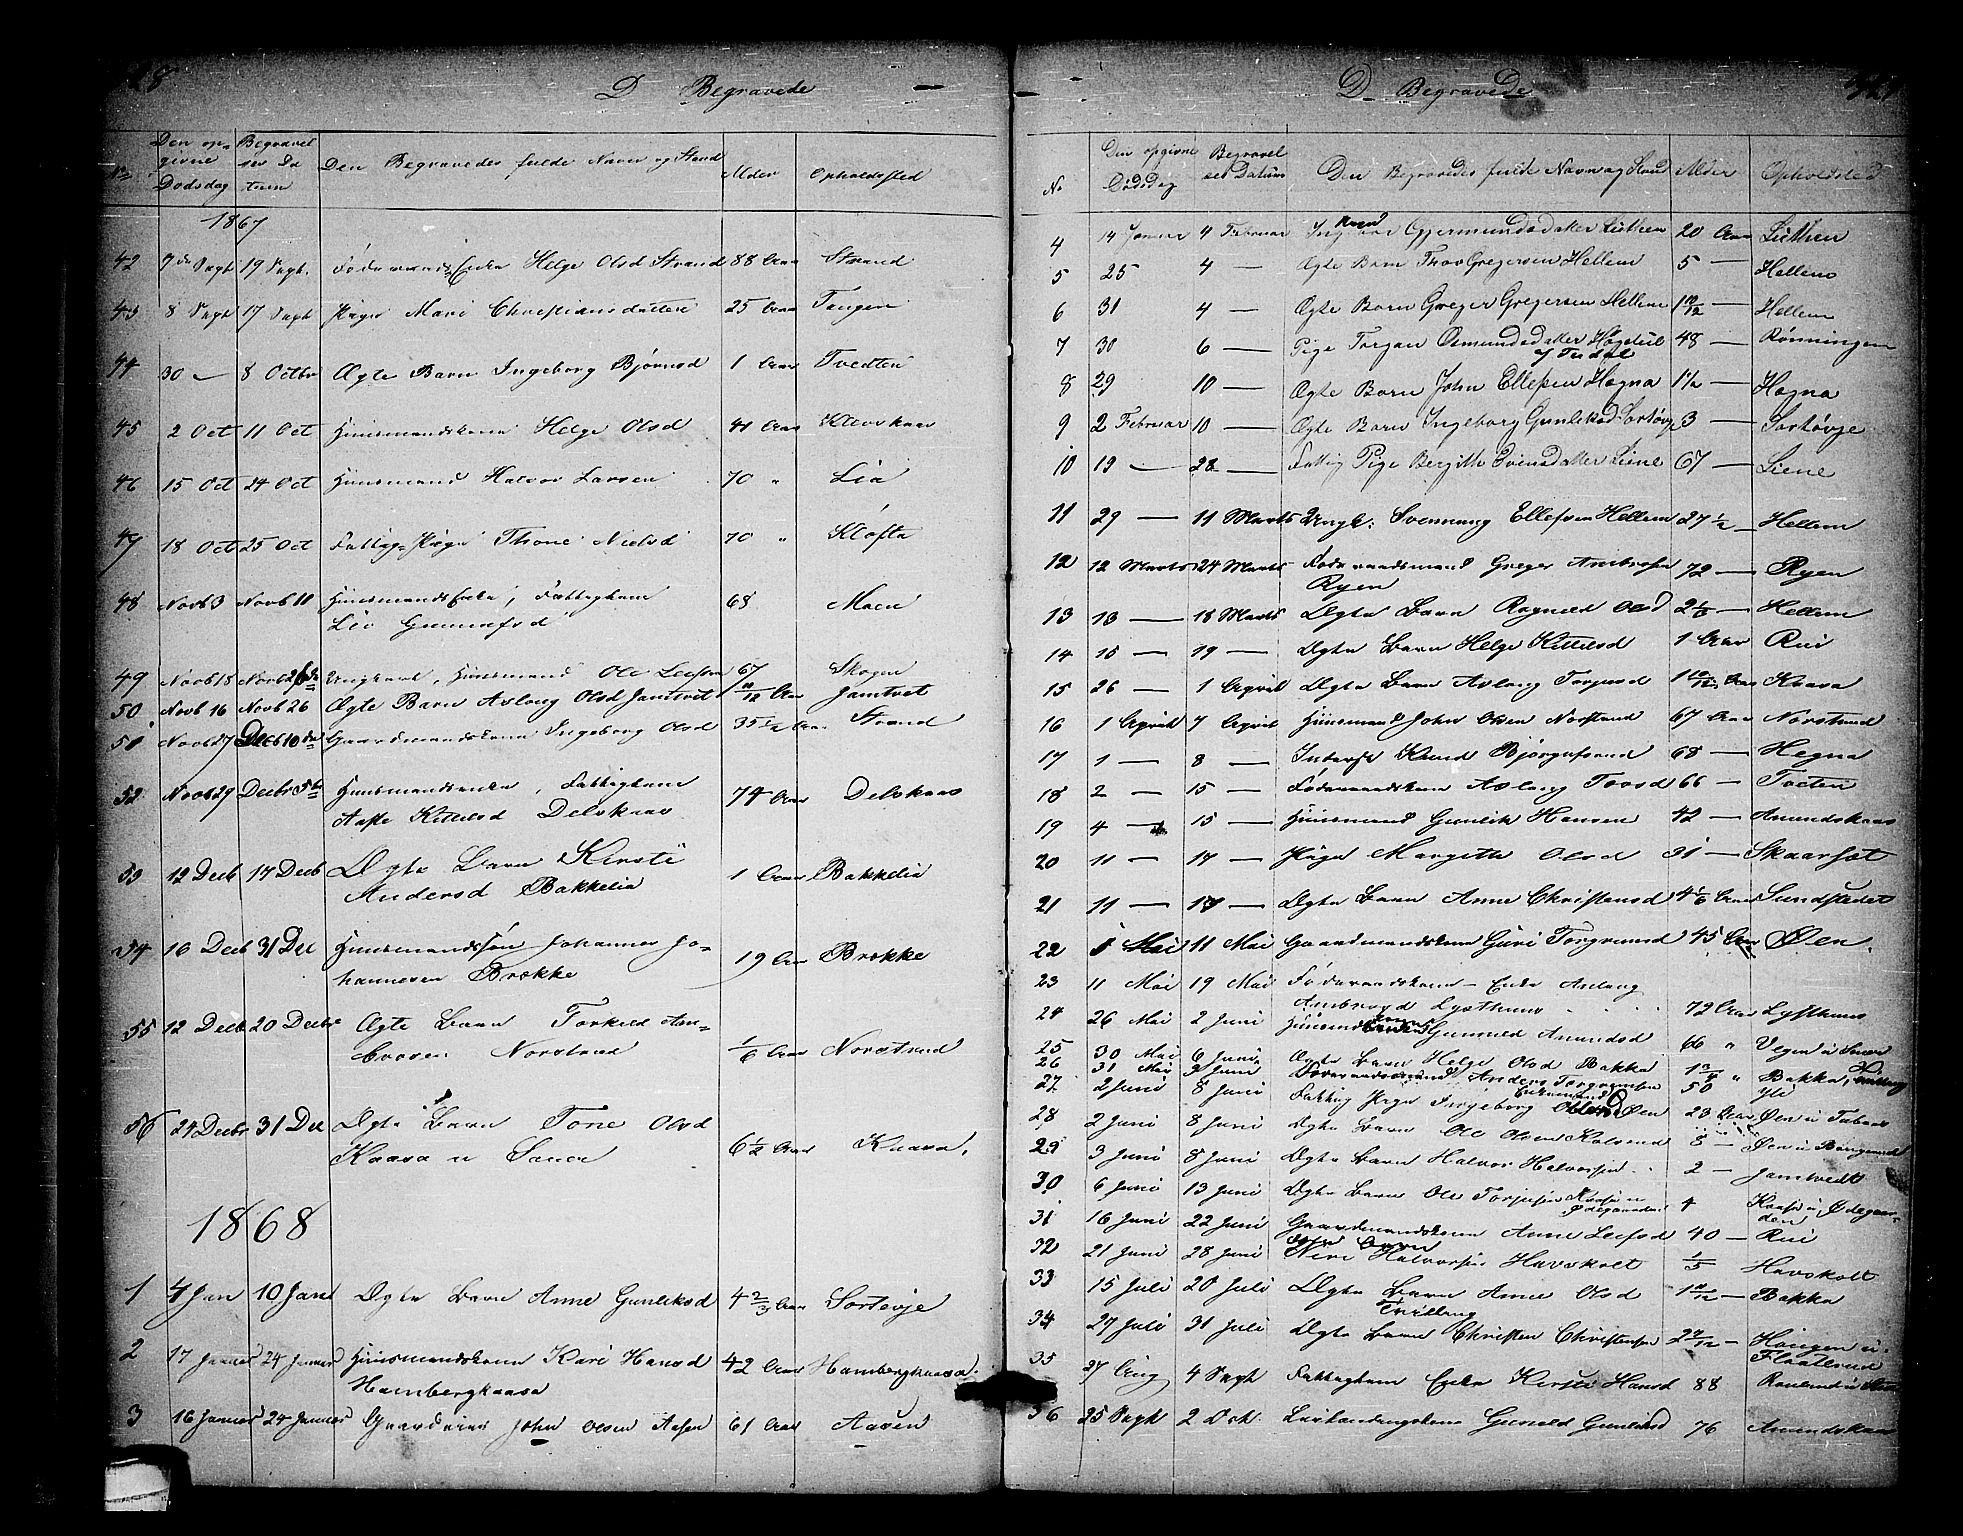 SAKO, Heddal kirkebøker, G/Ga/L0001: Klokkerbok nr. I 1, 1866-1878, s. 328-329